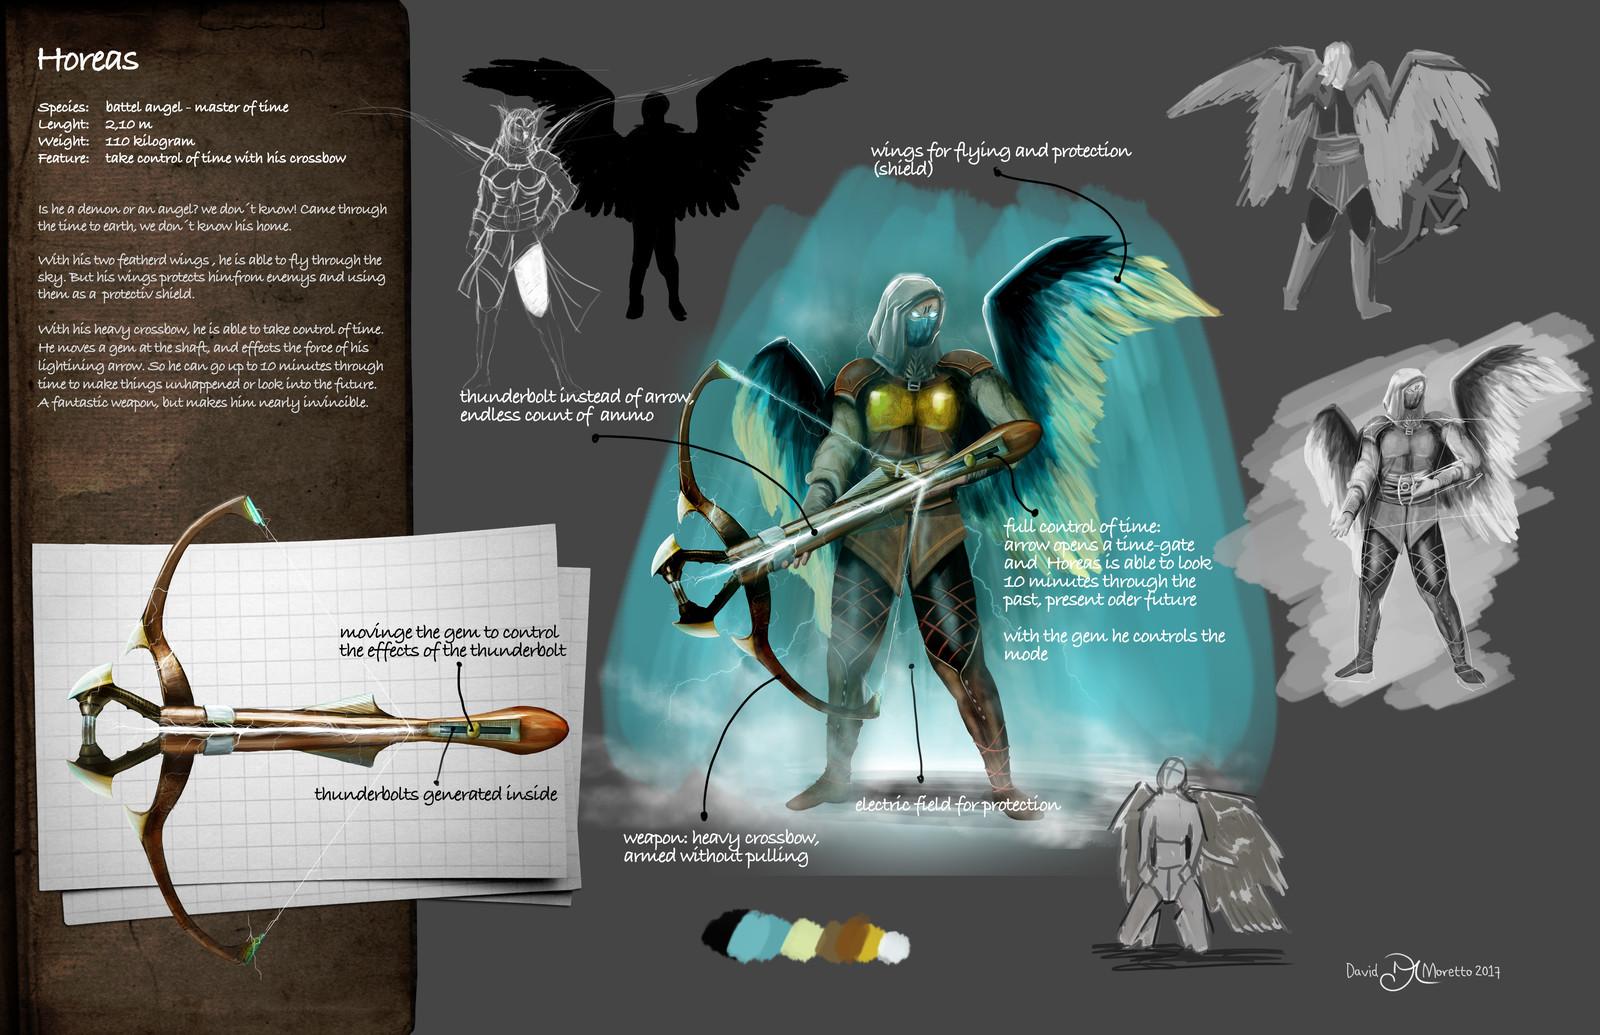 Concept Art of Horeas - the battle angel